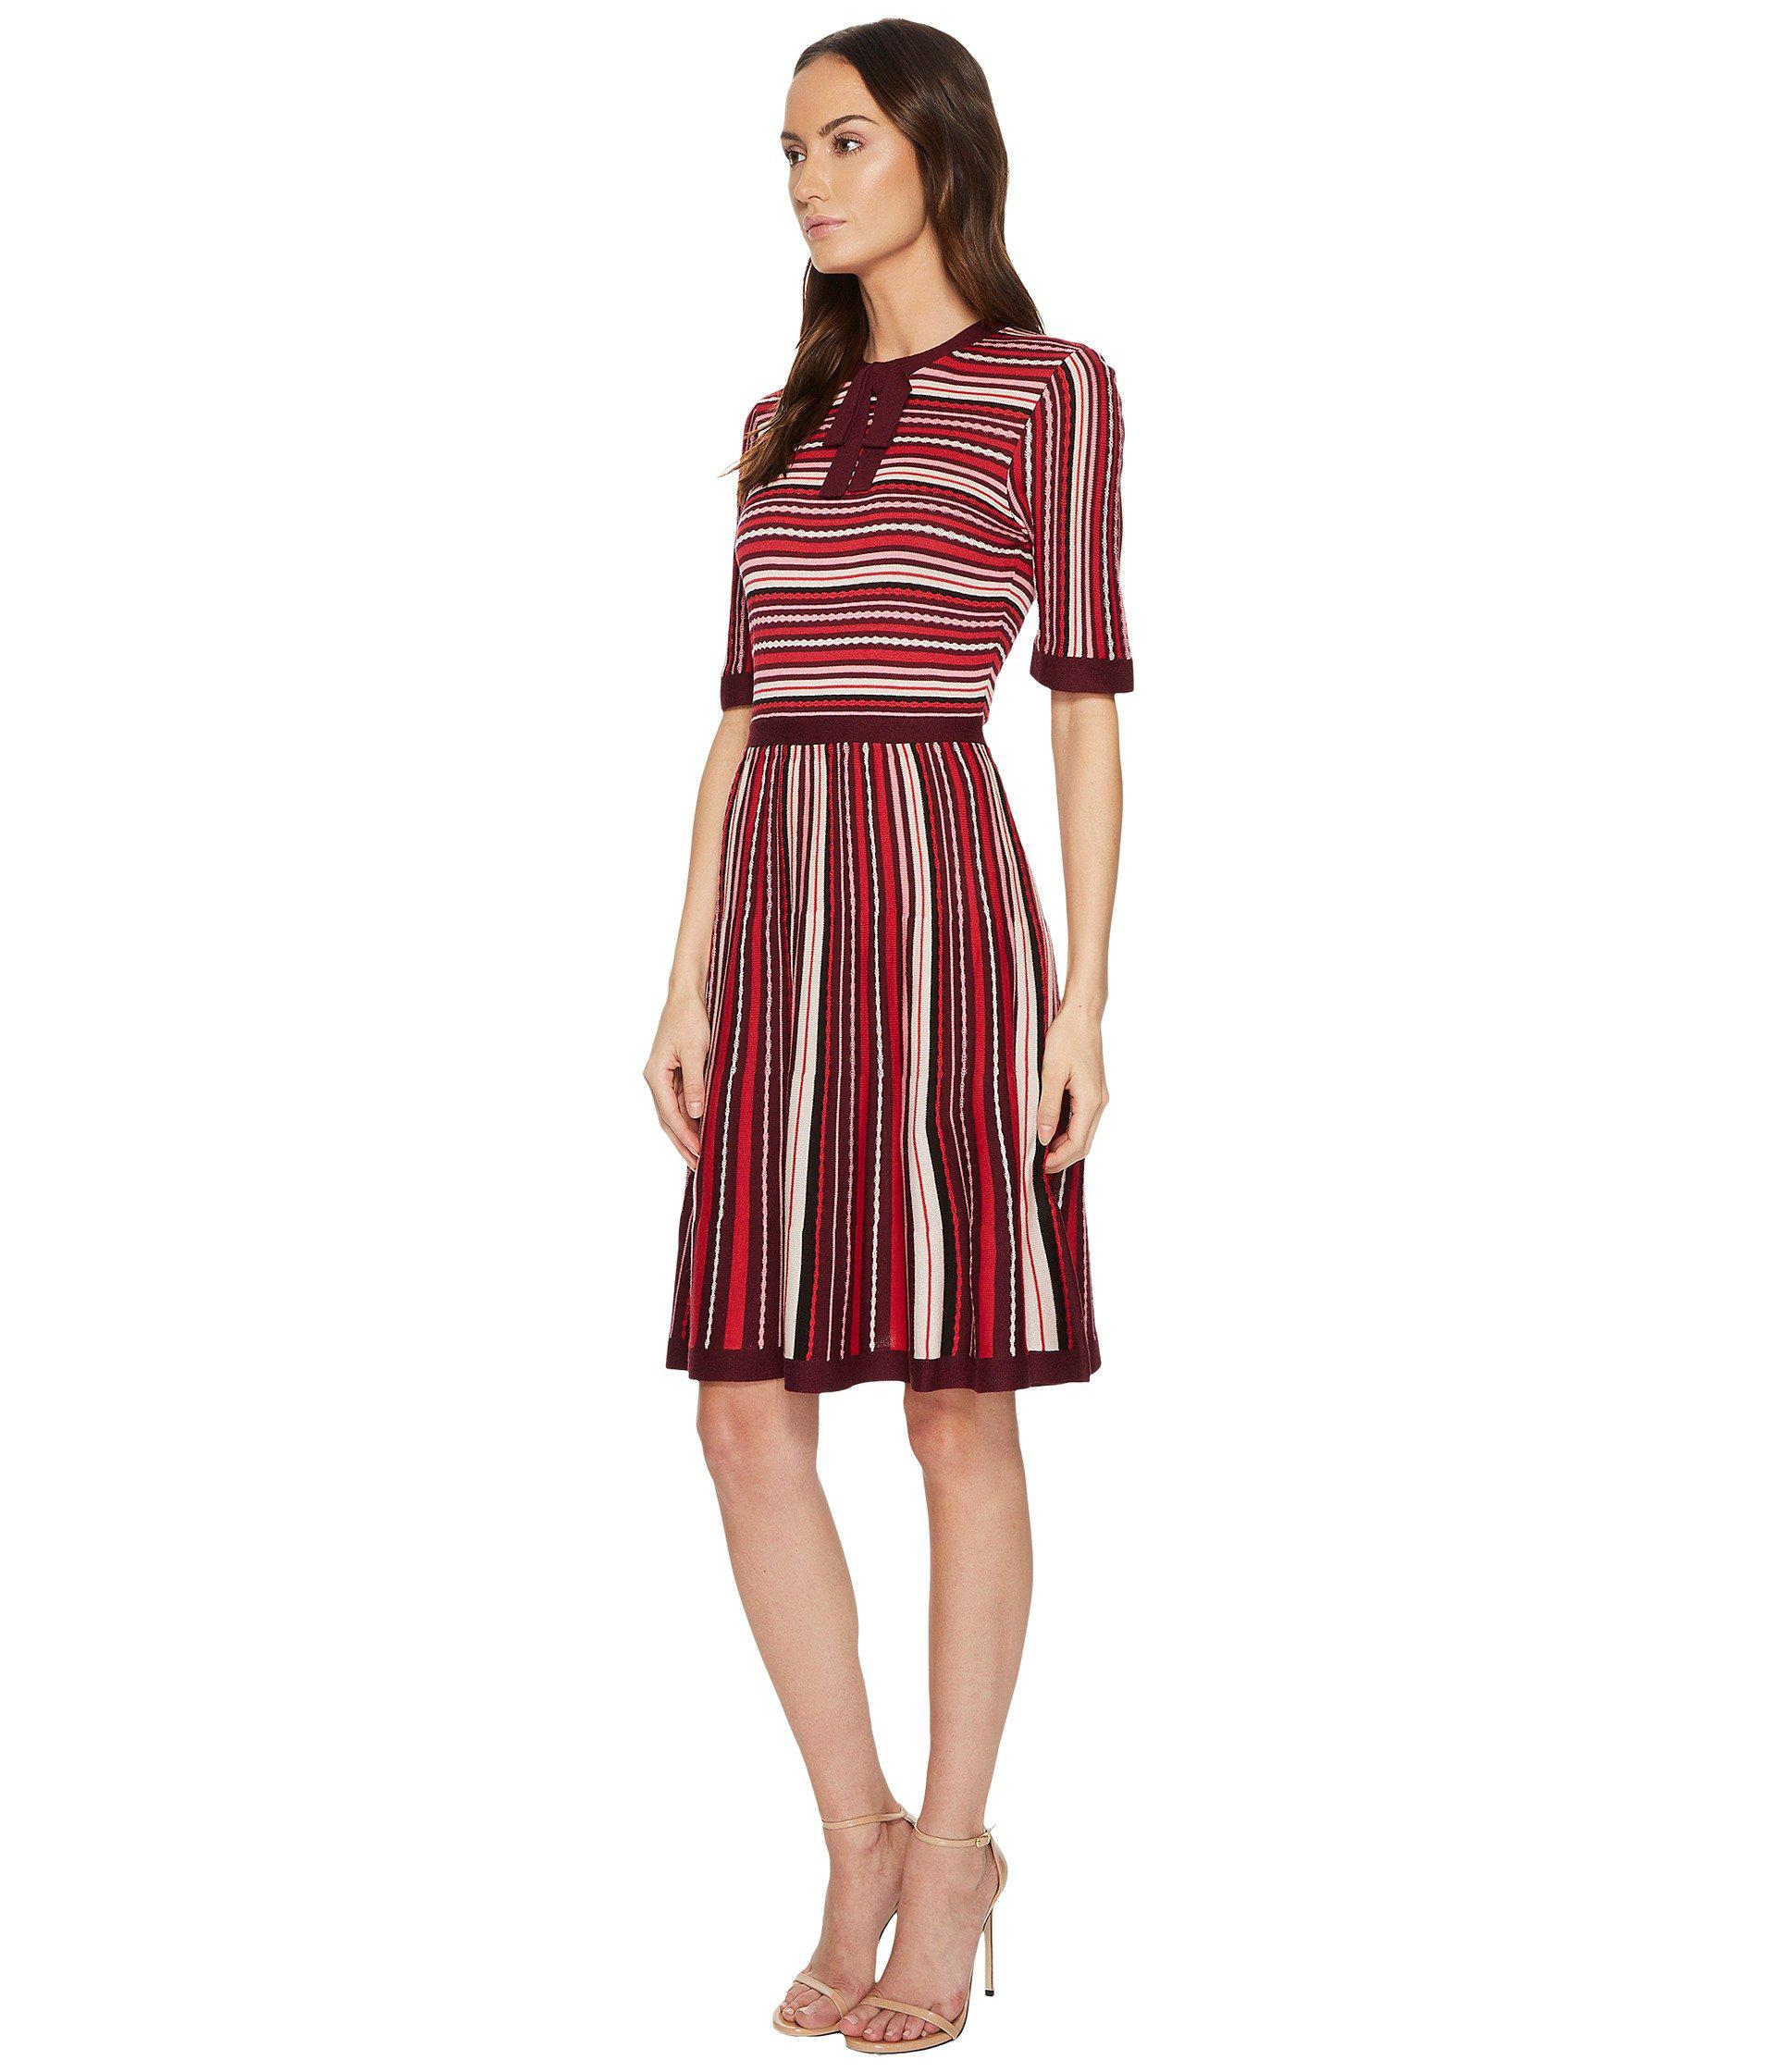 37a36bd57762 Lyst - Kate Spade Multi Stripe Sweater Dress in Red